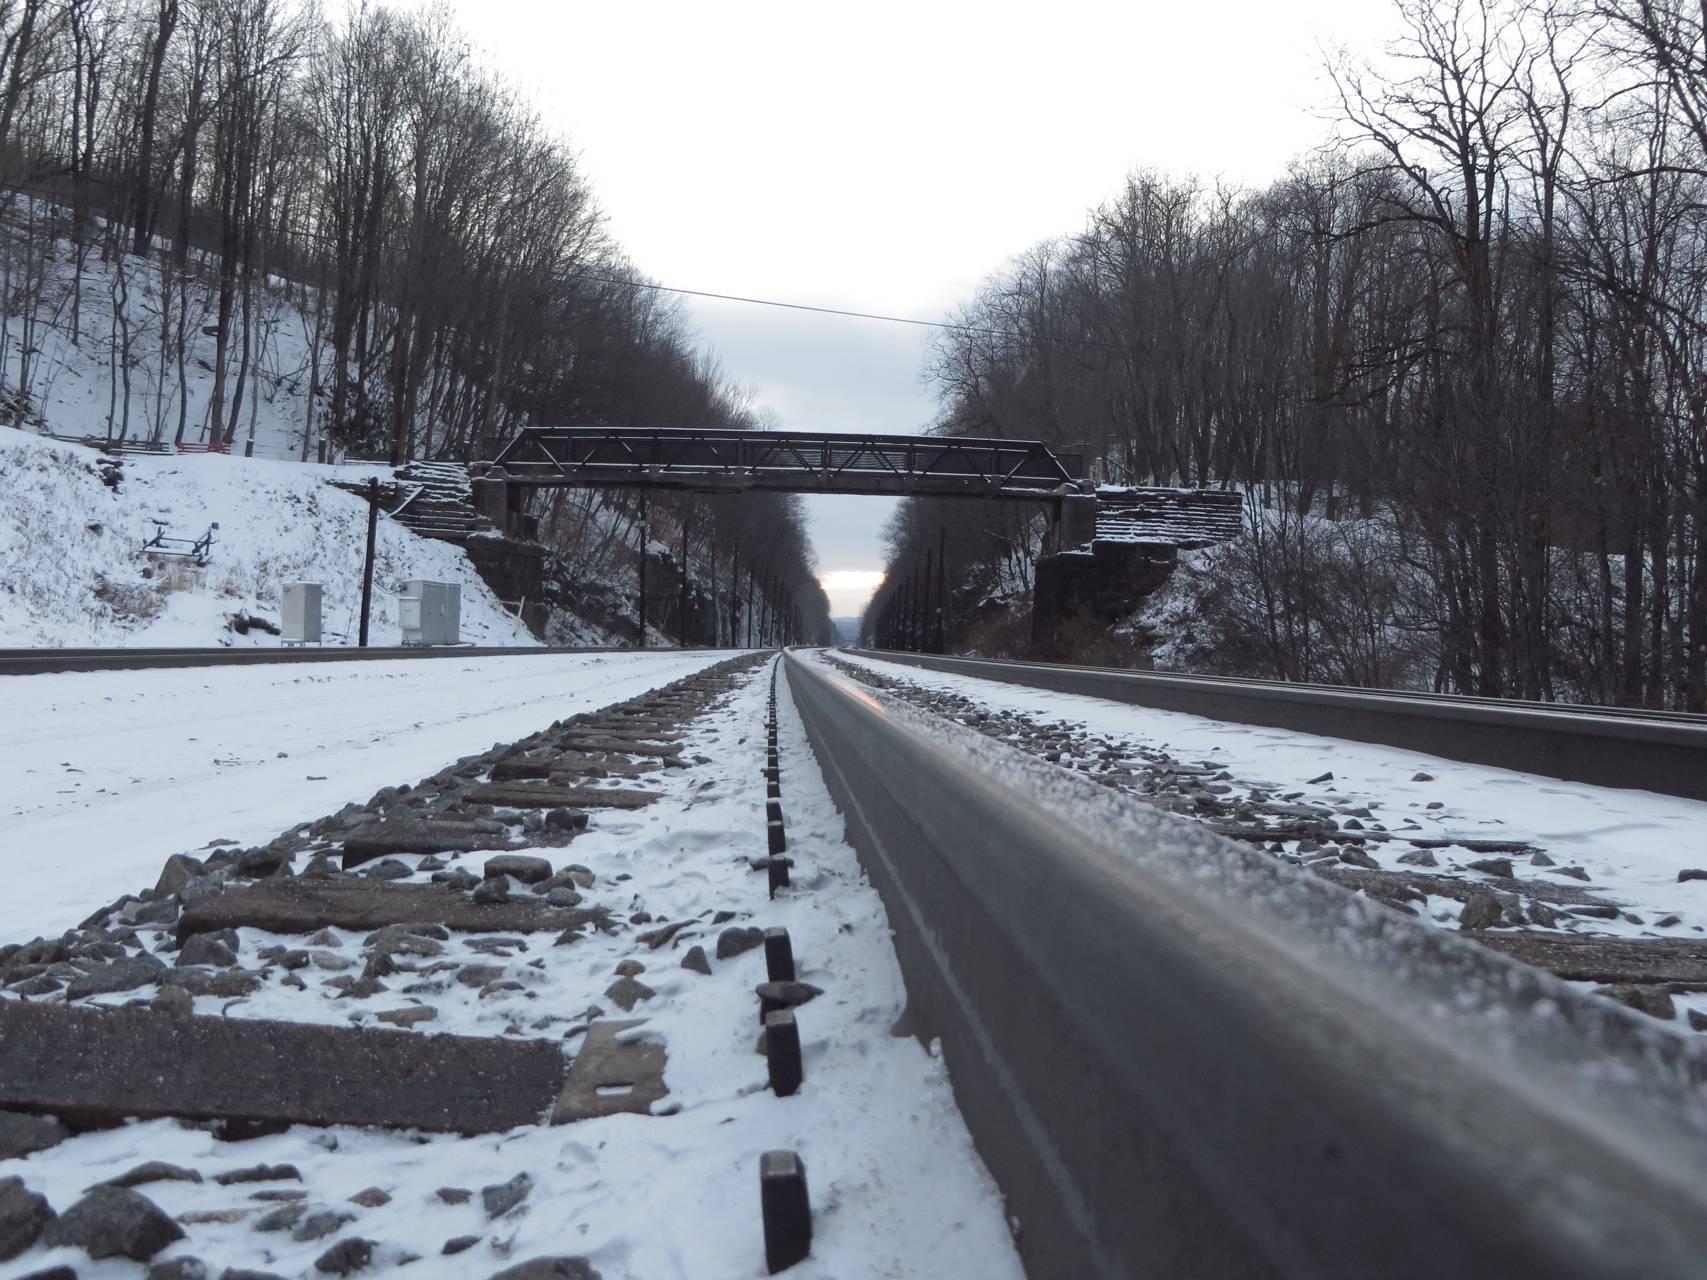 Snowy railroad track